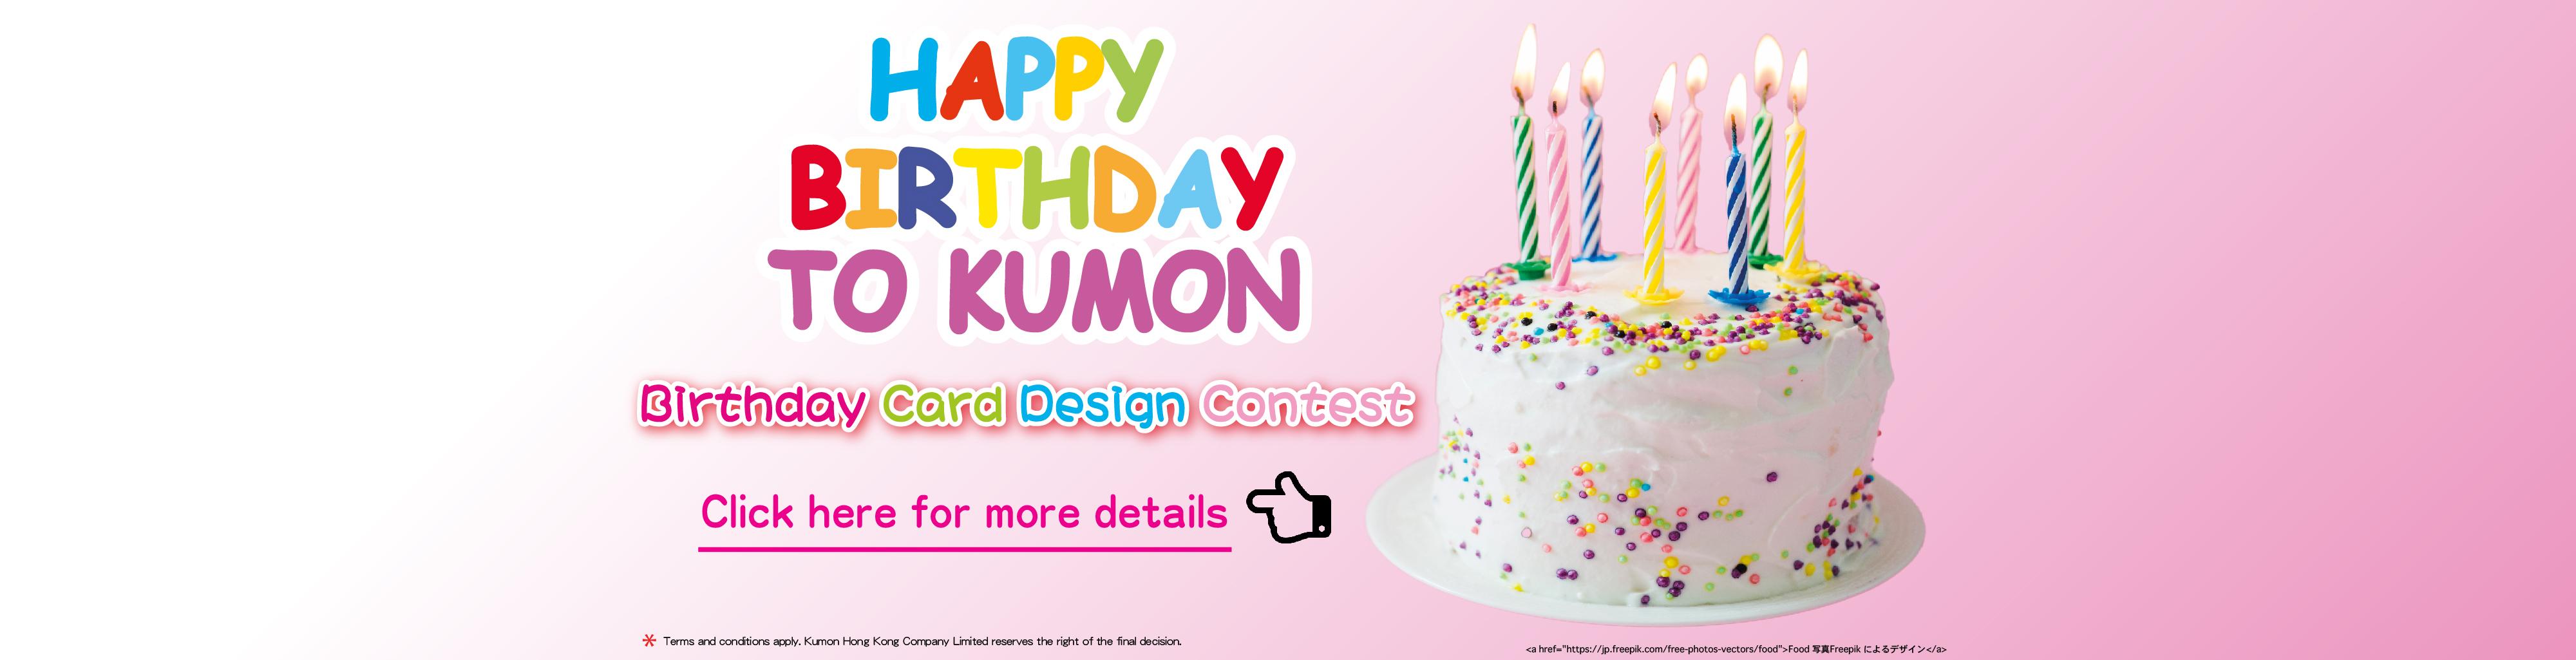 Birthday-card_websiteBanner_eng-02